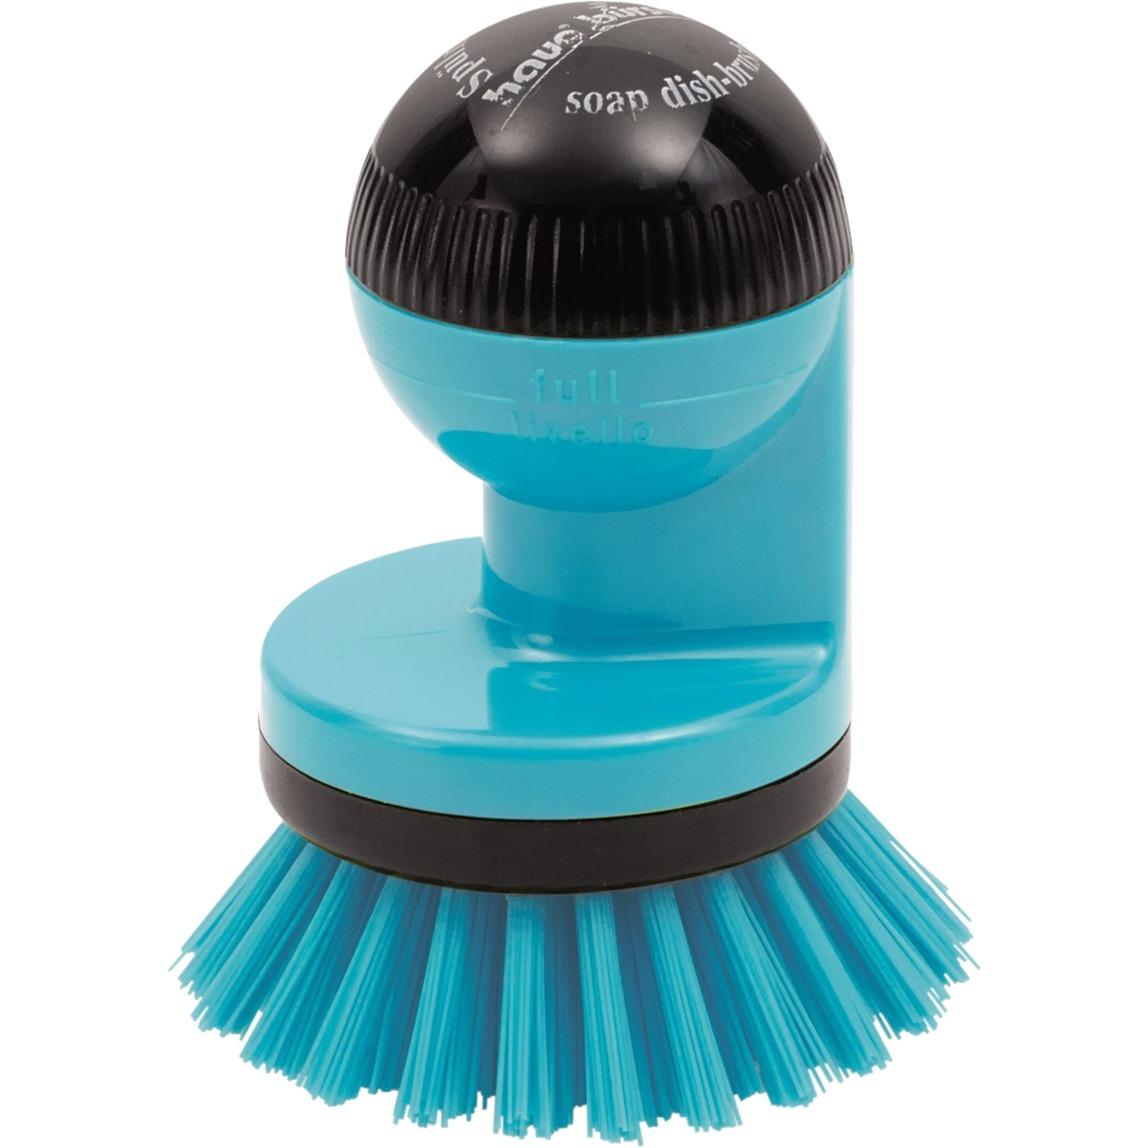 Dishwasher Brush Blue De plástico Negro, Azul, Cepillo